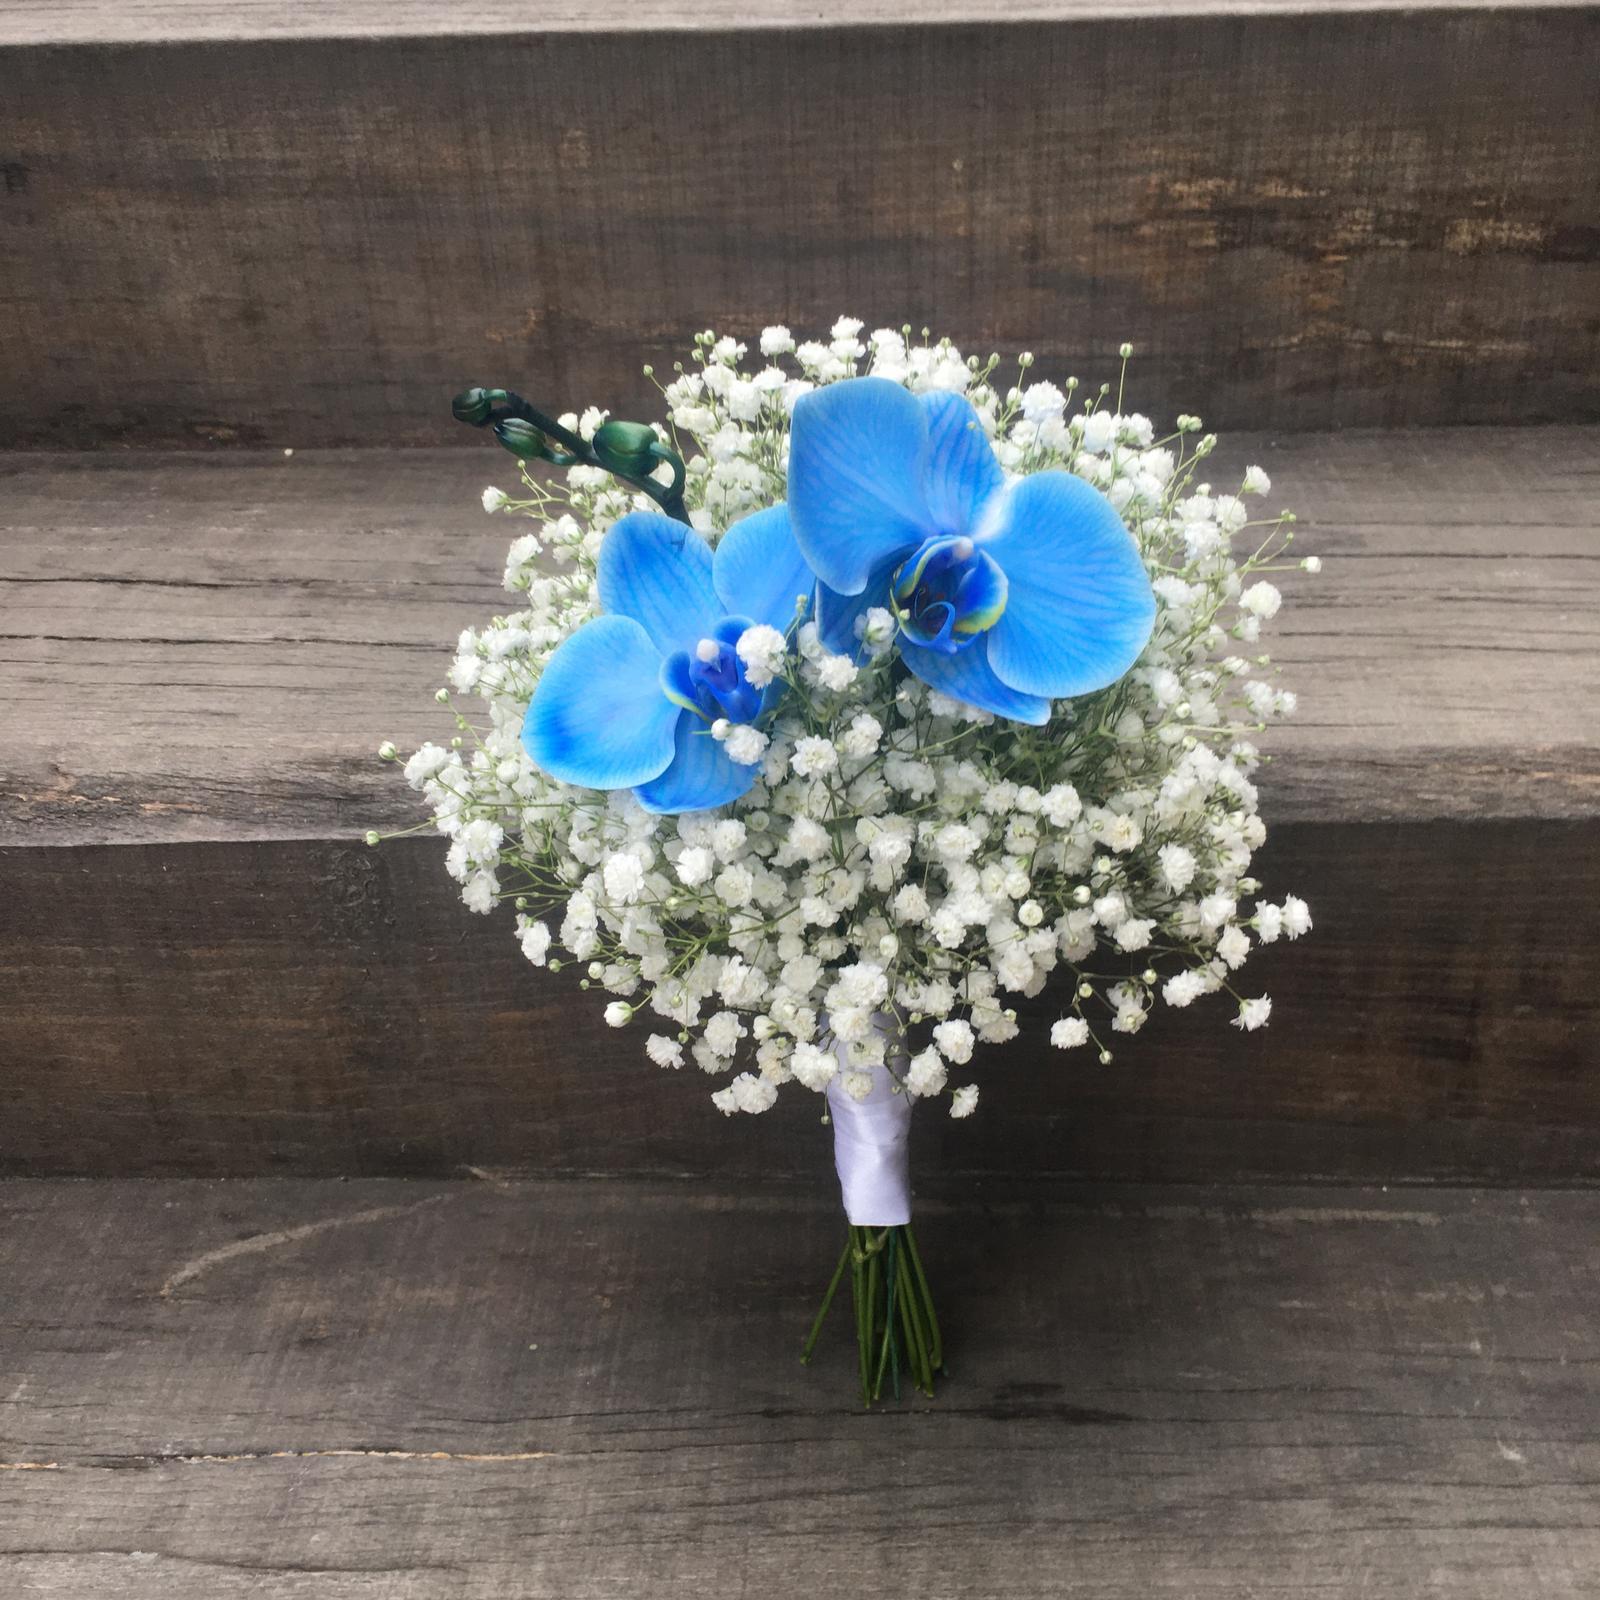 Gabriela Turanská - aranžmány - Svadba na lodi a svadobná kytica gypsomilka a modrá orchidea